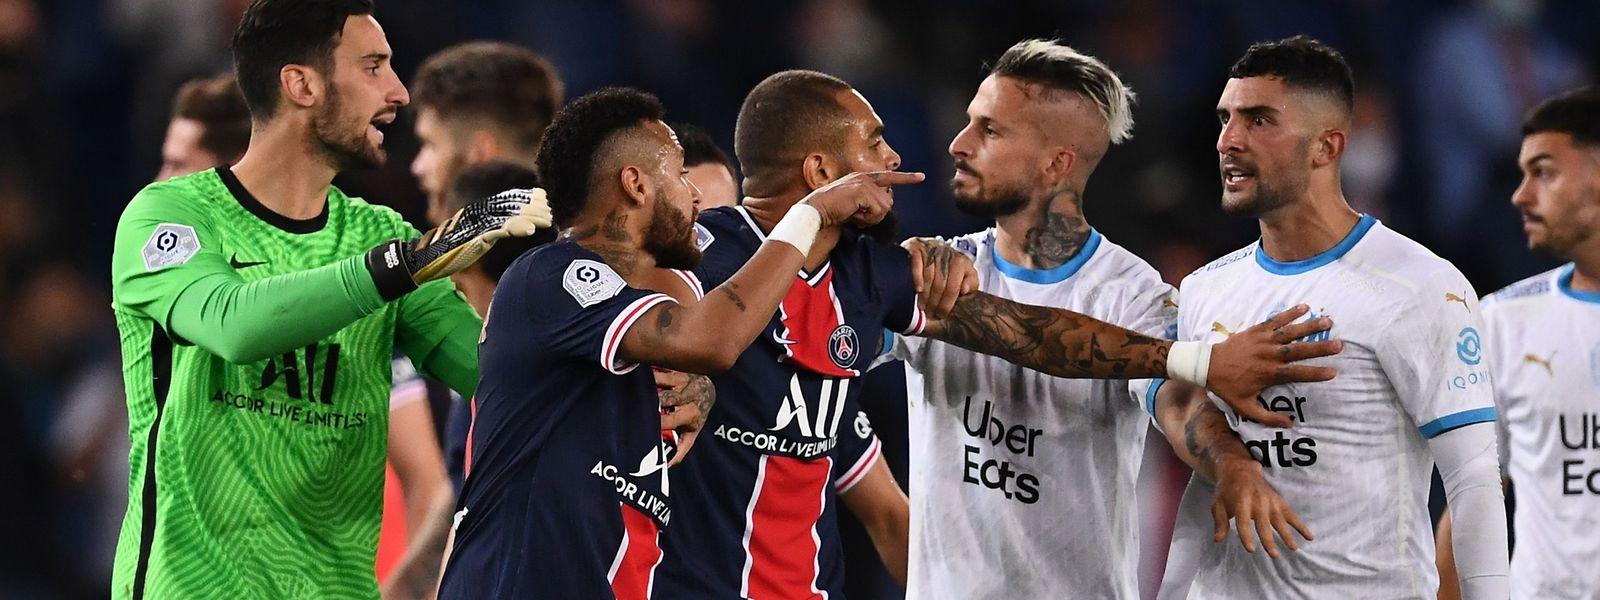 Neymar geht auf Alvaro Gonzalez los.